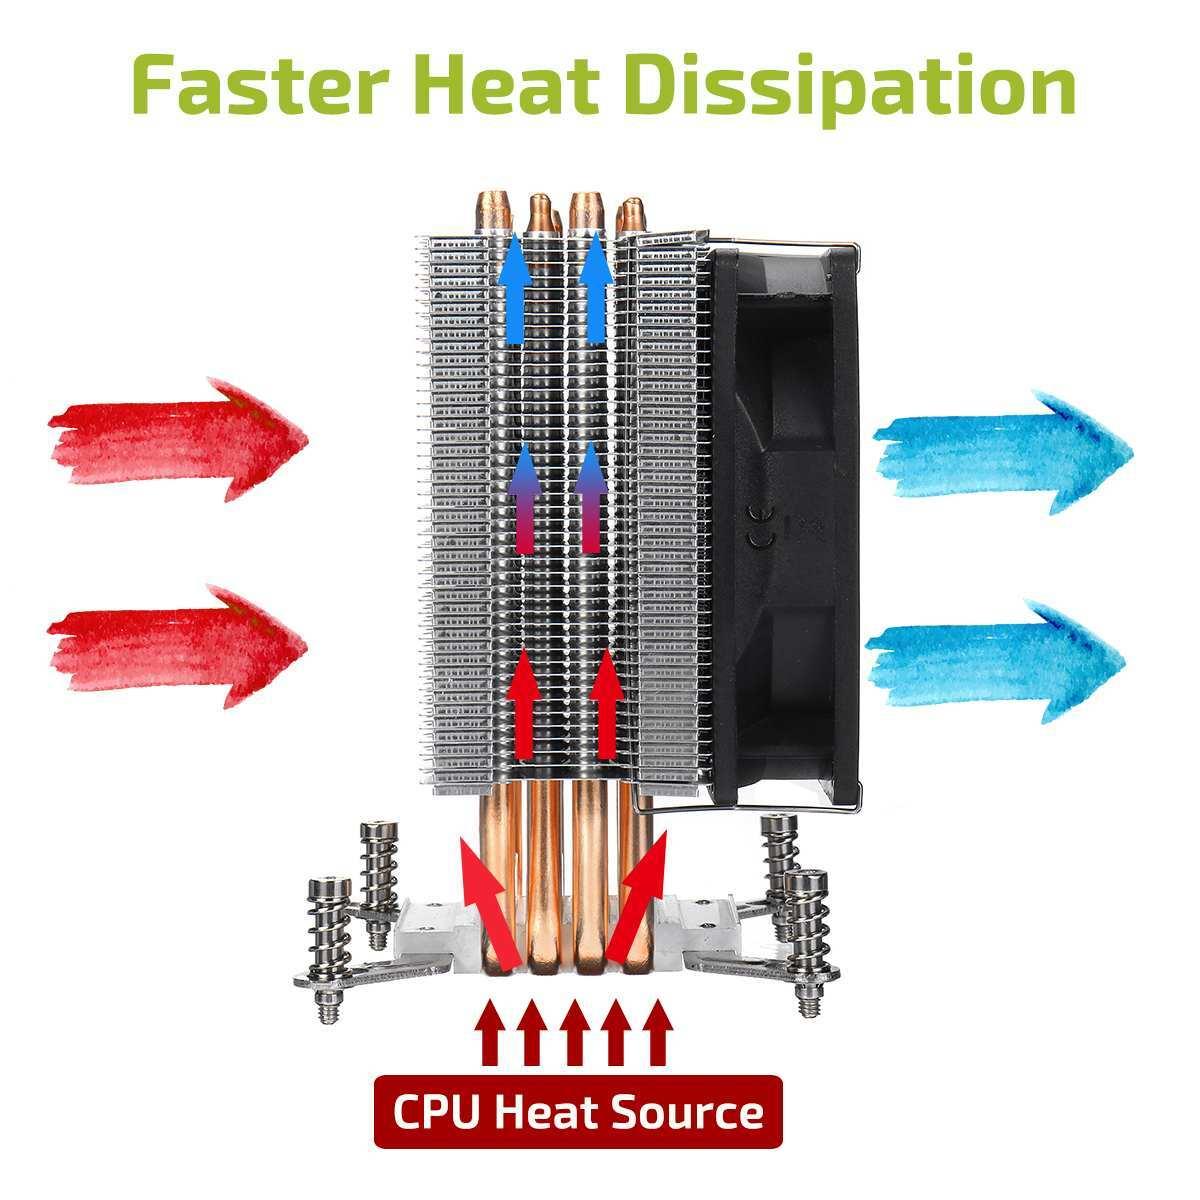 CPU Cooler Cooling 4 Copper Heatpipe Fan Radiator 90mm 3Pin CPU Cooler Fan Cooling Heatsink for Intel LGA 2011 X79 X99 299